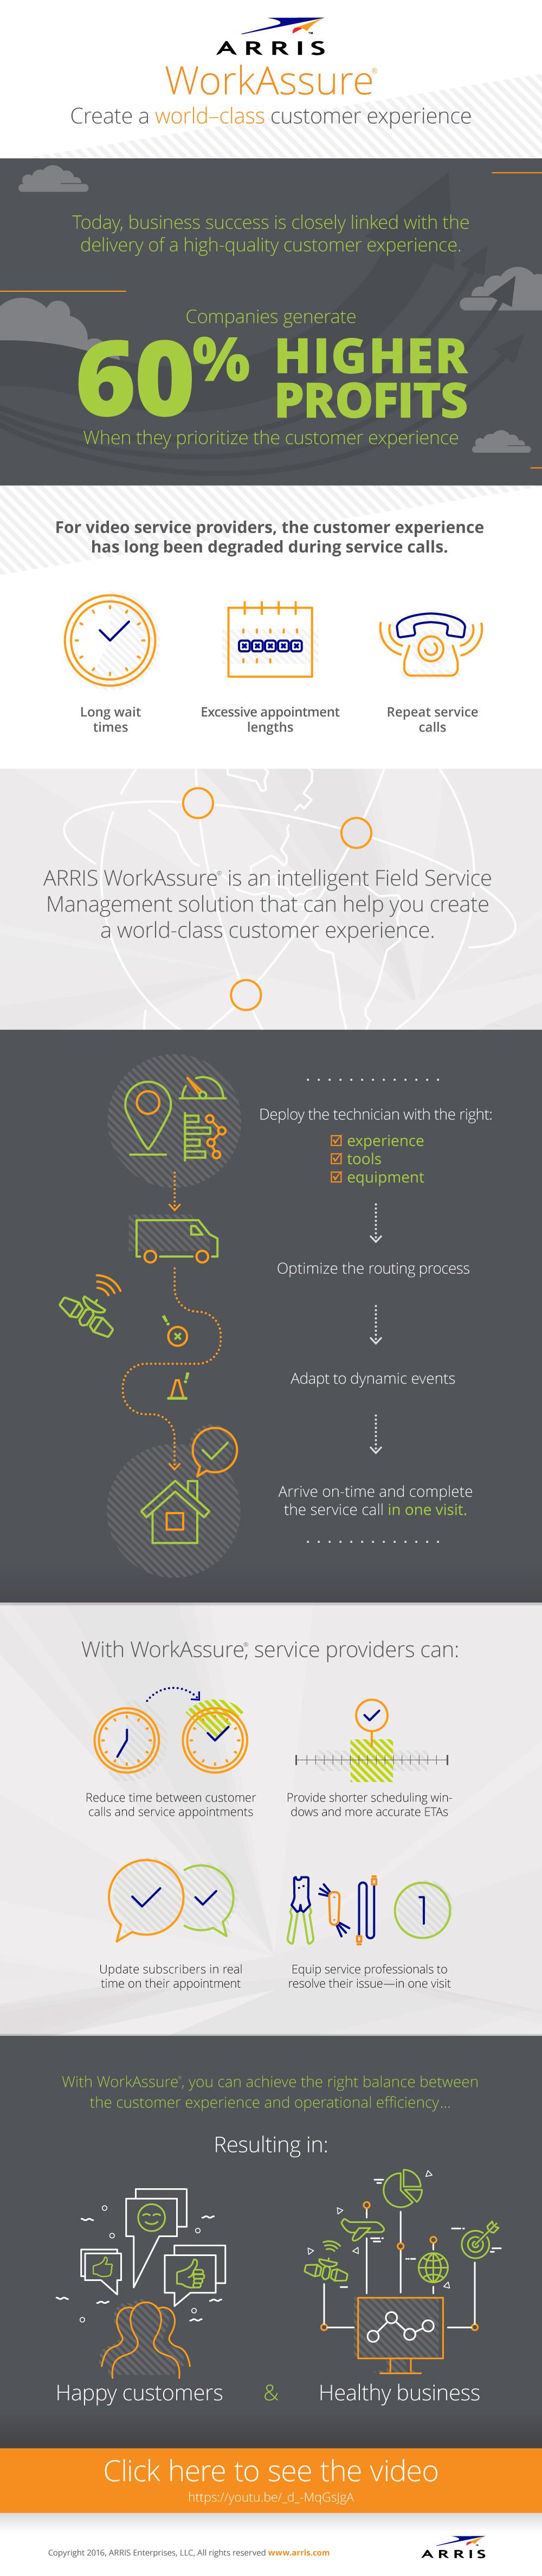 ARR1735_WorkAssure_Infographic_R4.jpg